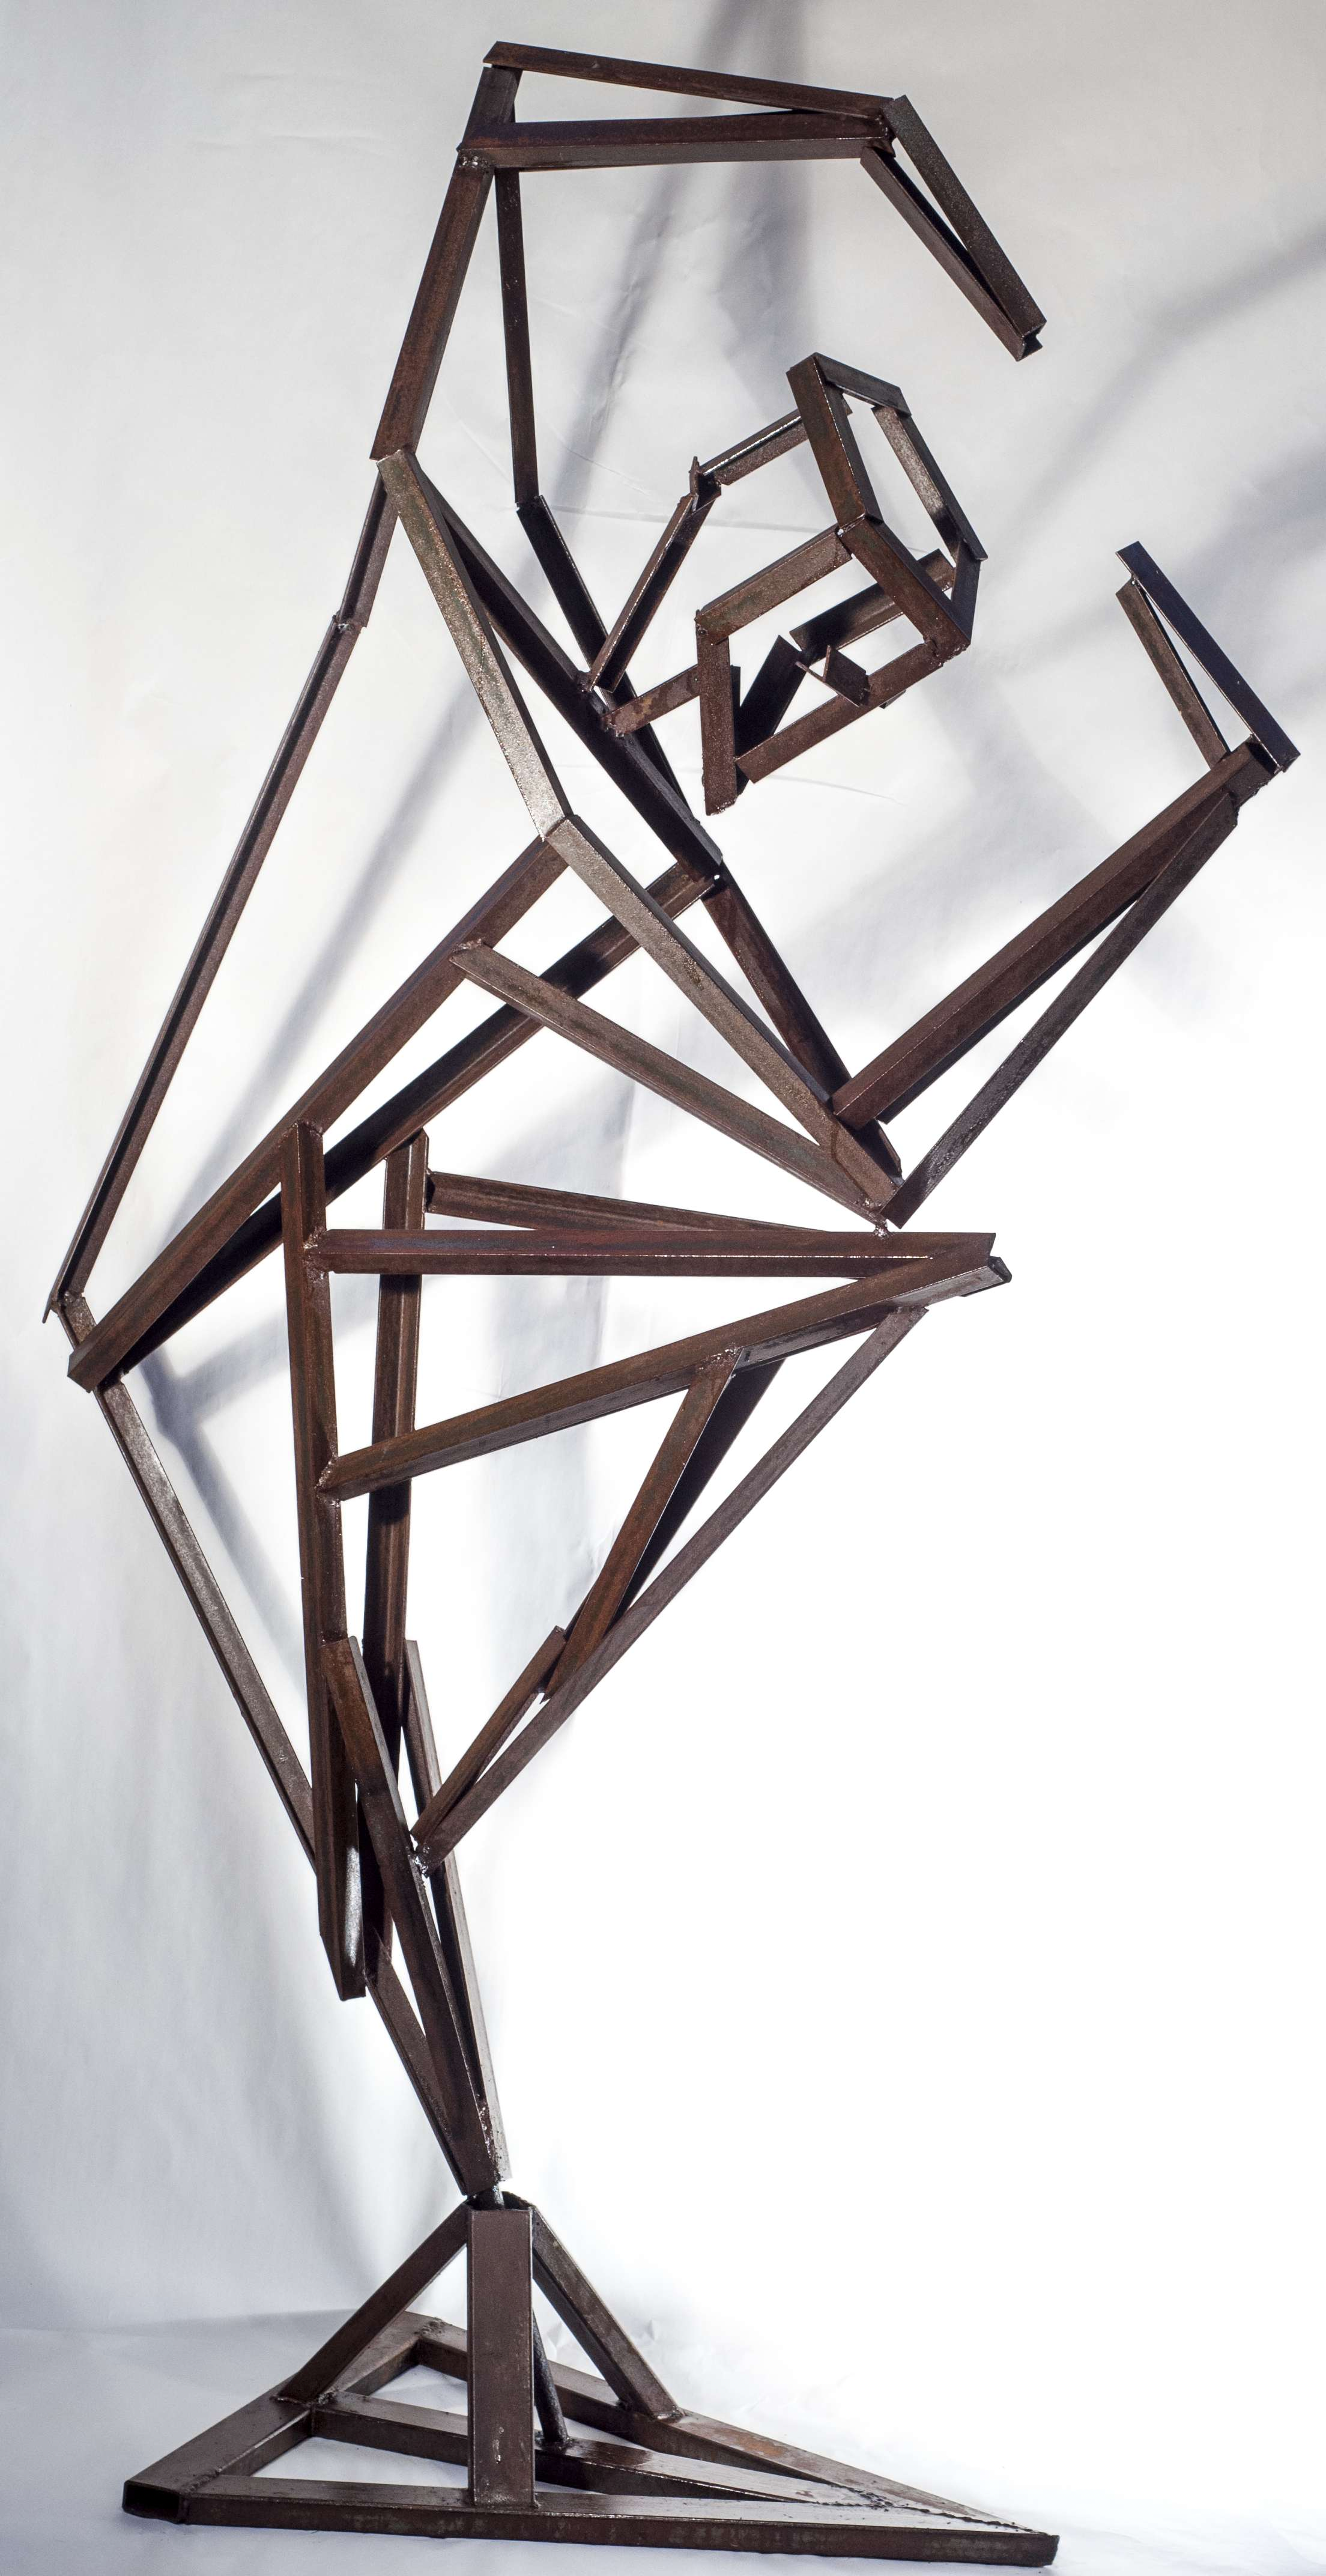 figurative angle iron sculpture